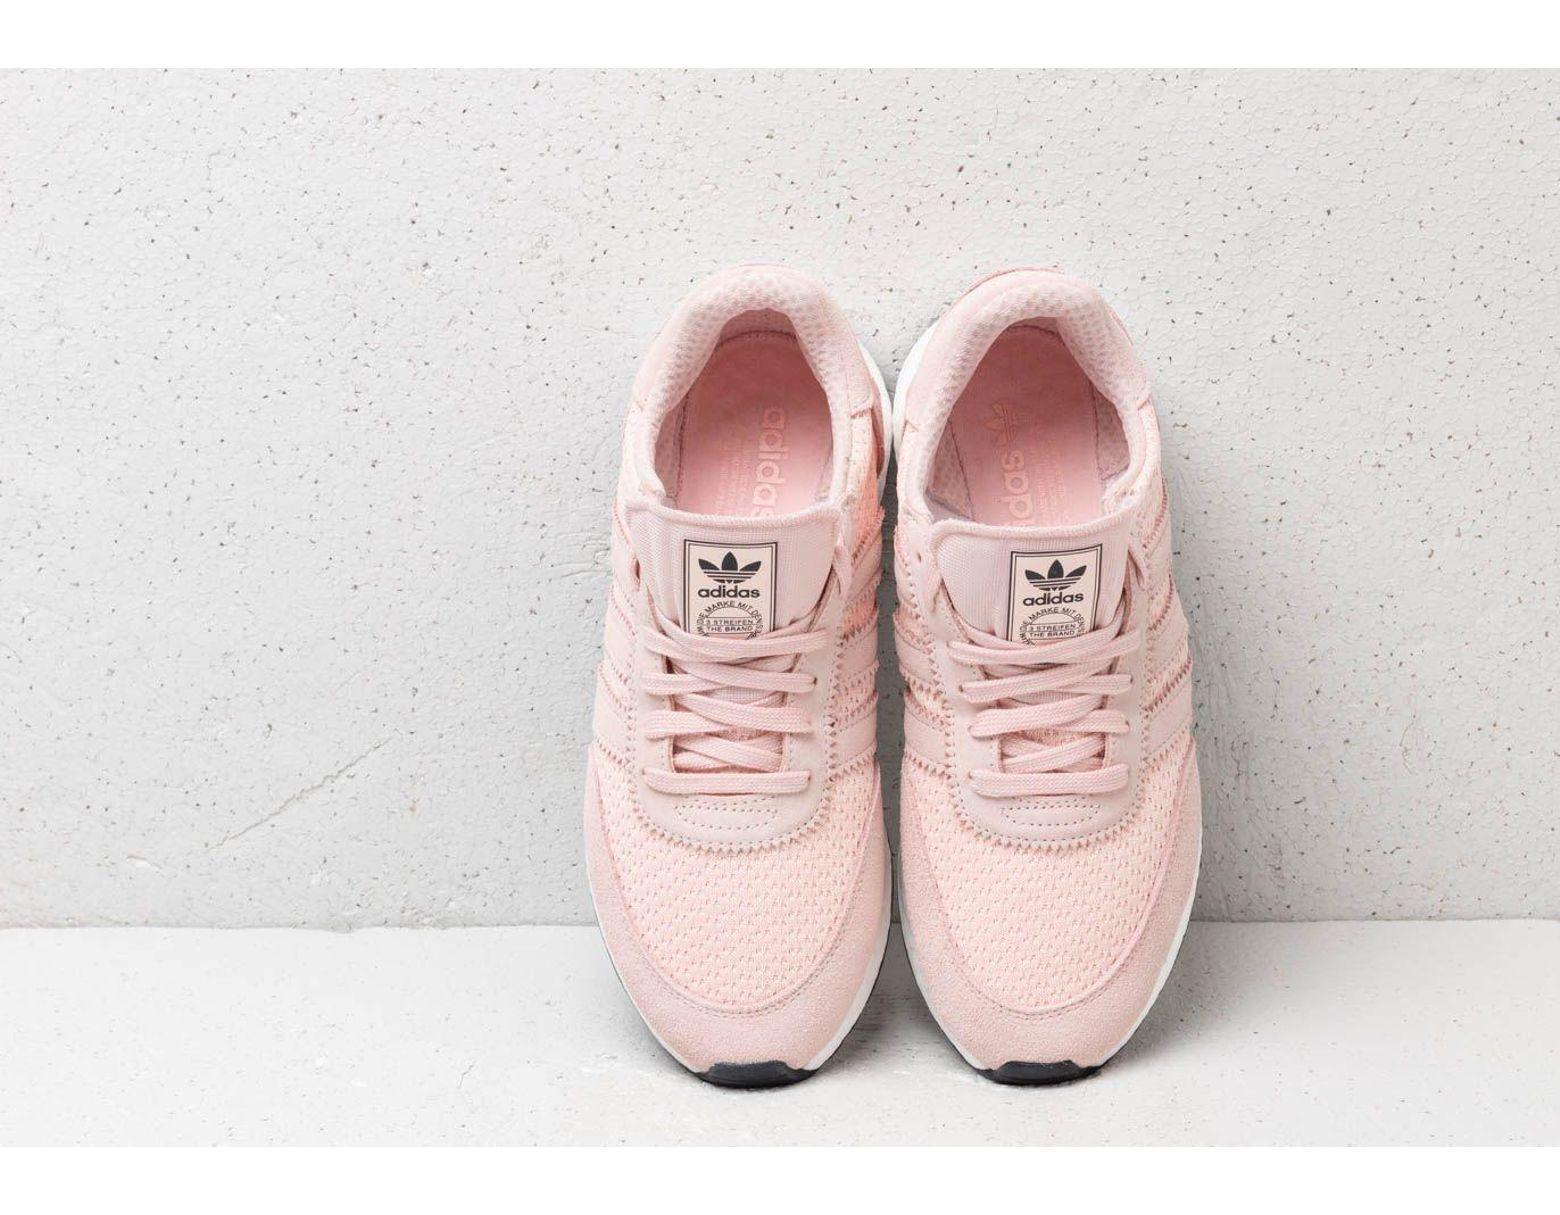 3fef3a1b516a3e adidas-originals-Pink-Adidas-I-5923-Icey-Pink-Icey-Pink-Core-Black.jpeg